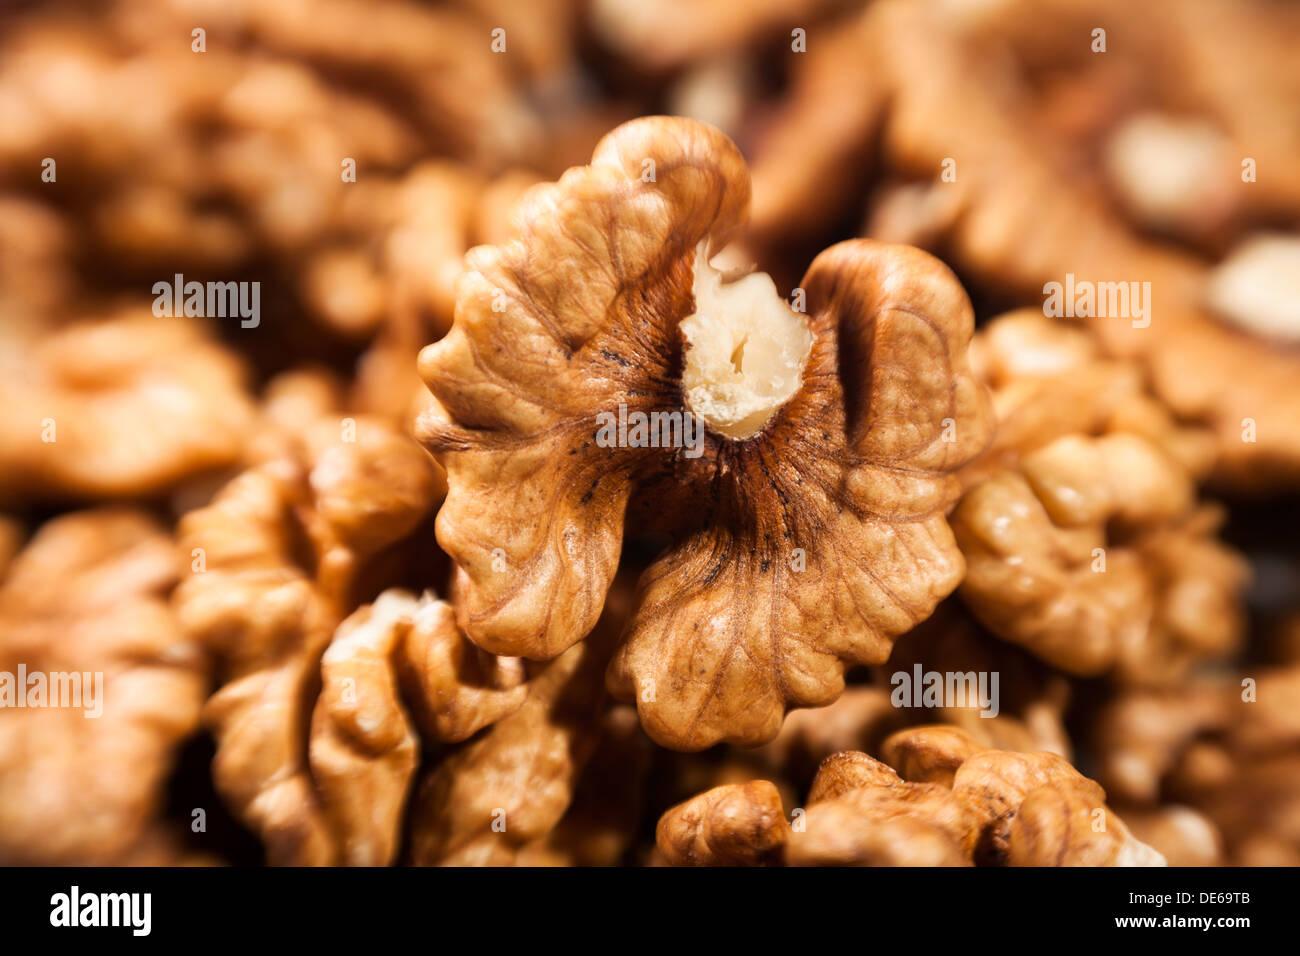 walnut macro closeup half open - Stock Image